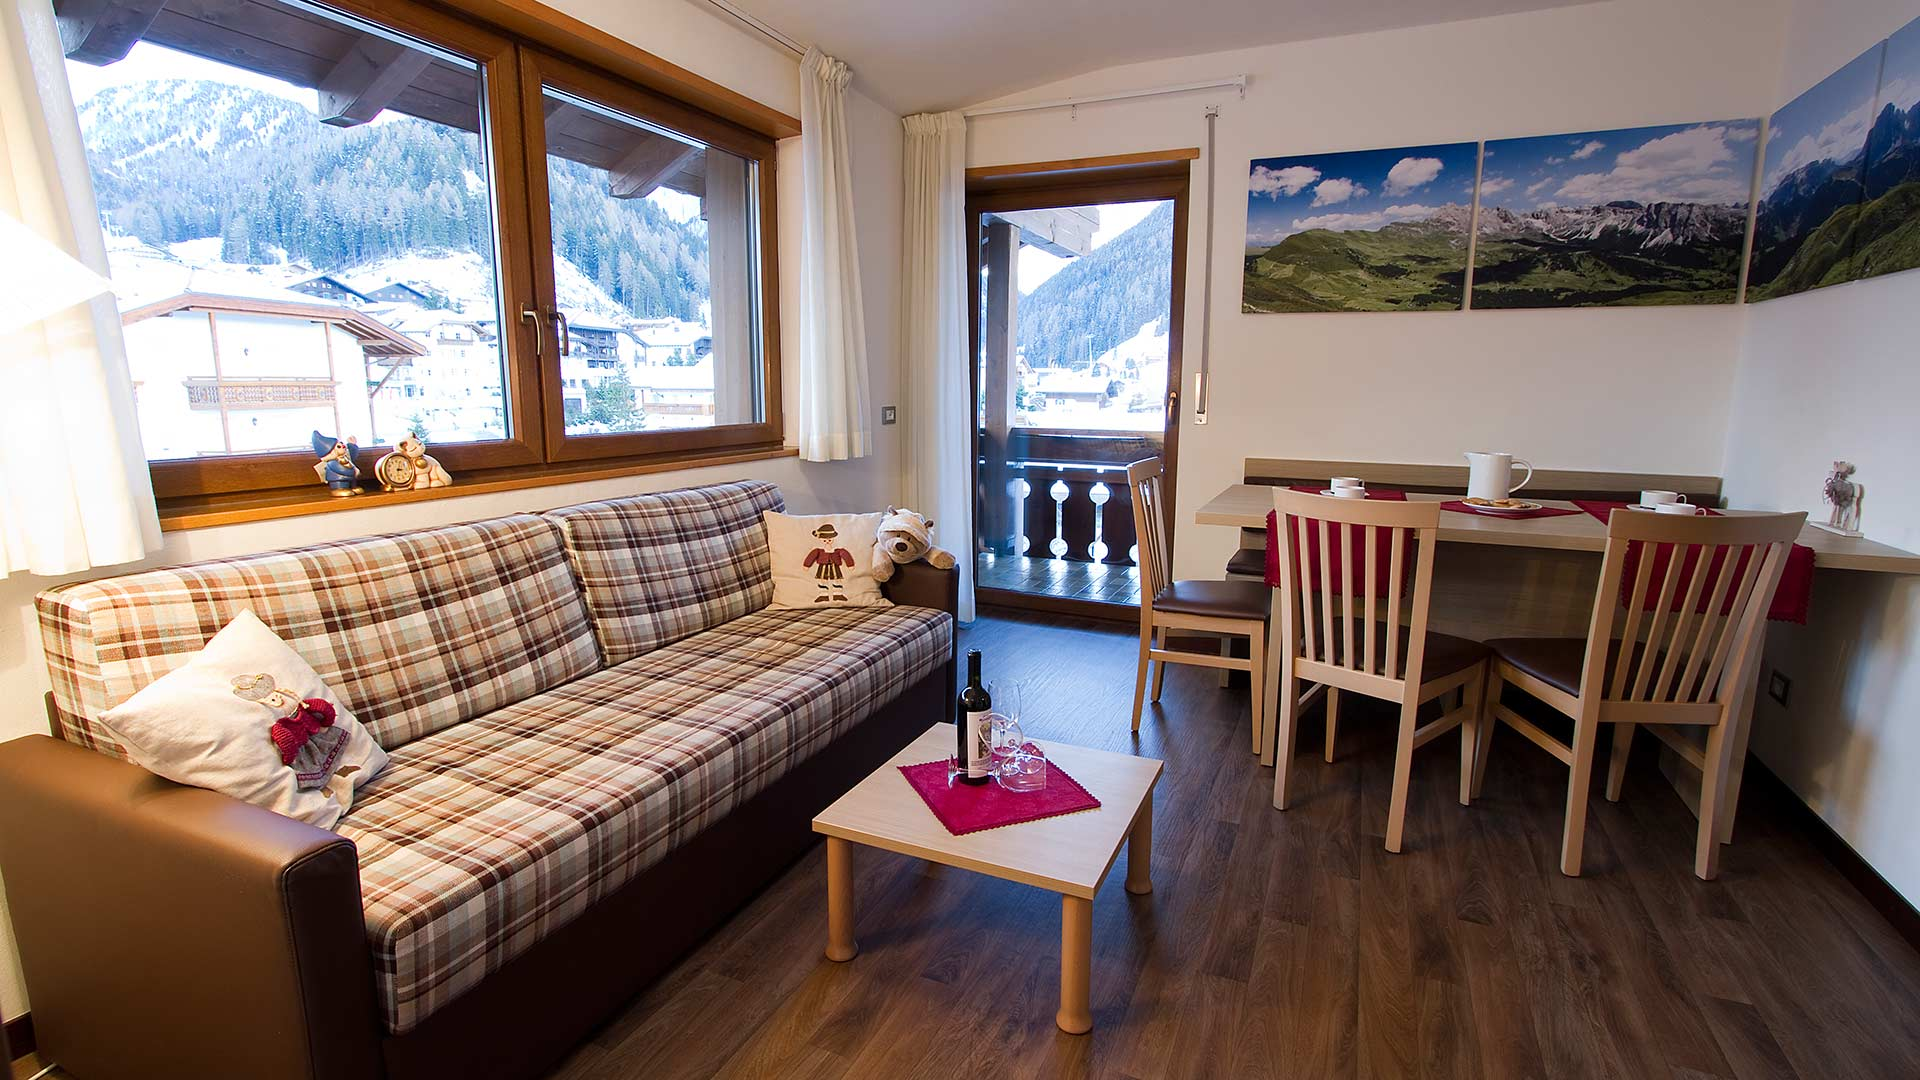 Appartamenti Ariola - Selva - Val Gardena - Dolomiti - Italia